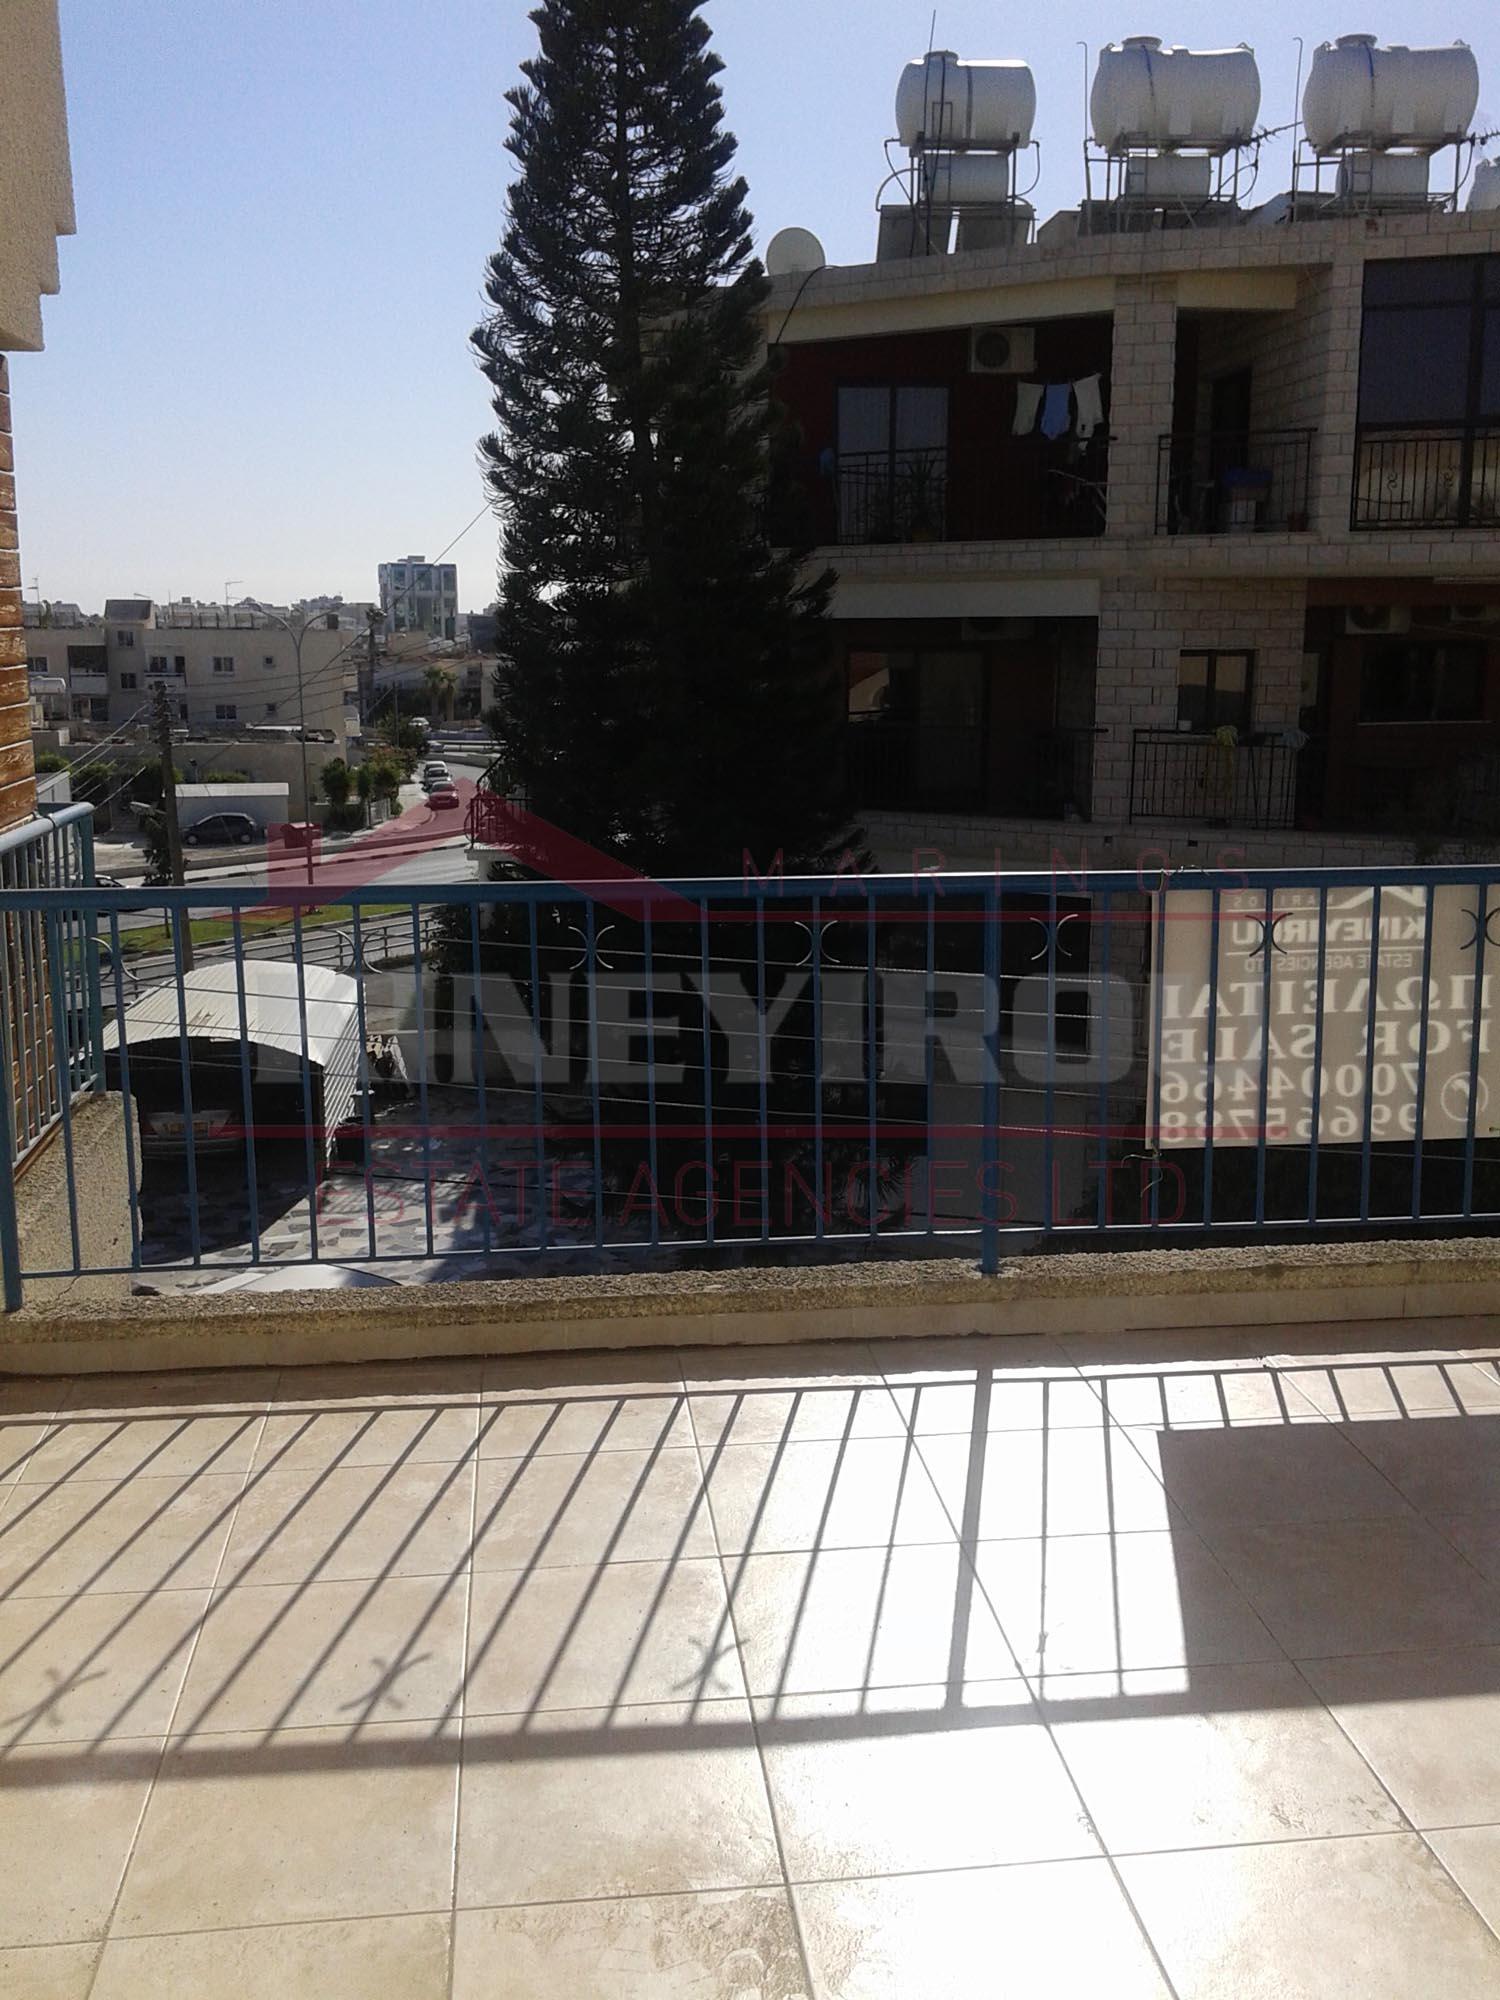 Cyprus Property , Apartment near Salamina stadium, Larnaca